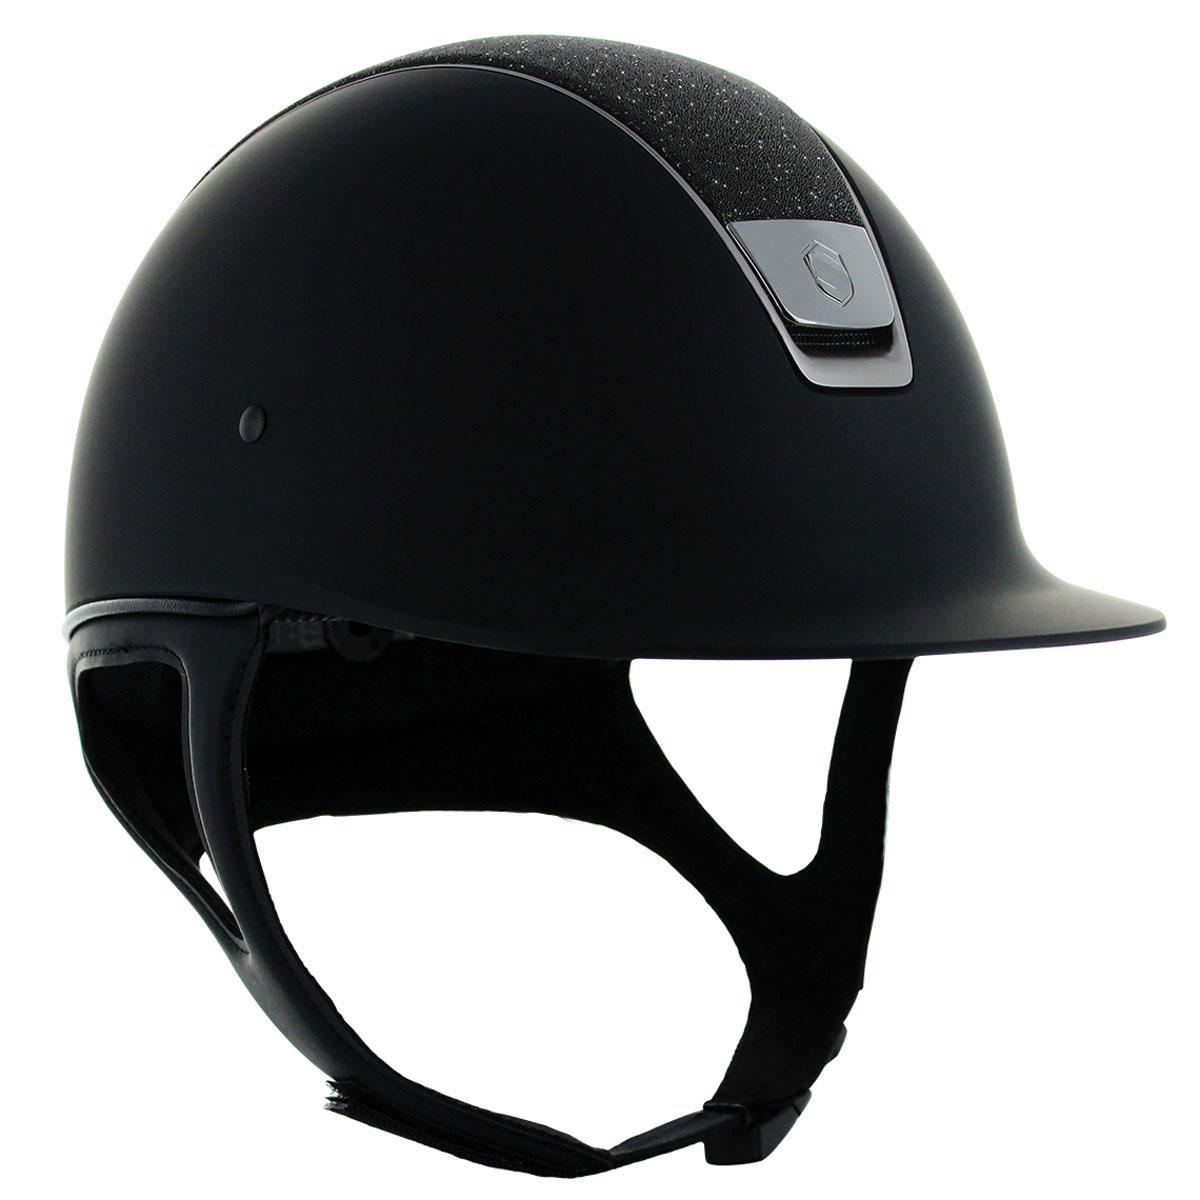 Samshield Shadow Matt Crystal Fabric Top Helmet